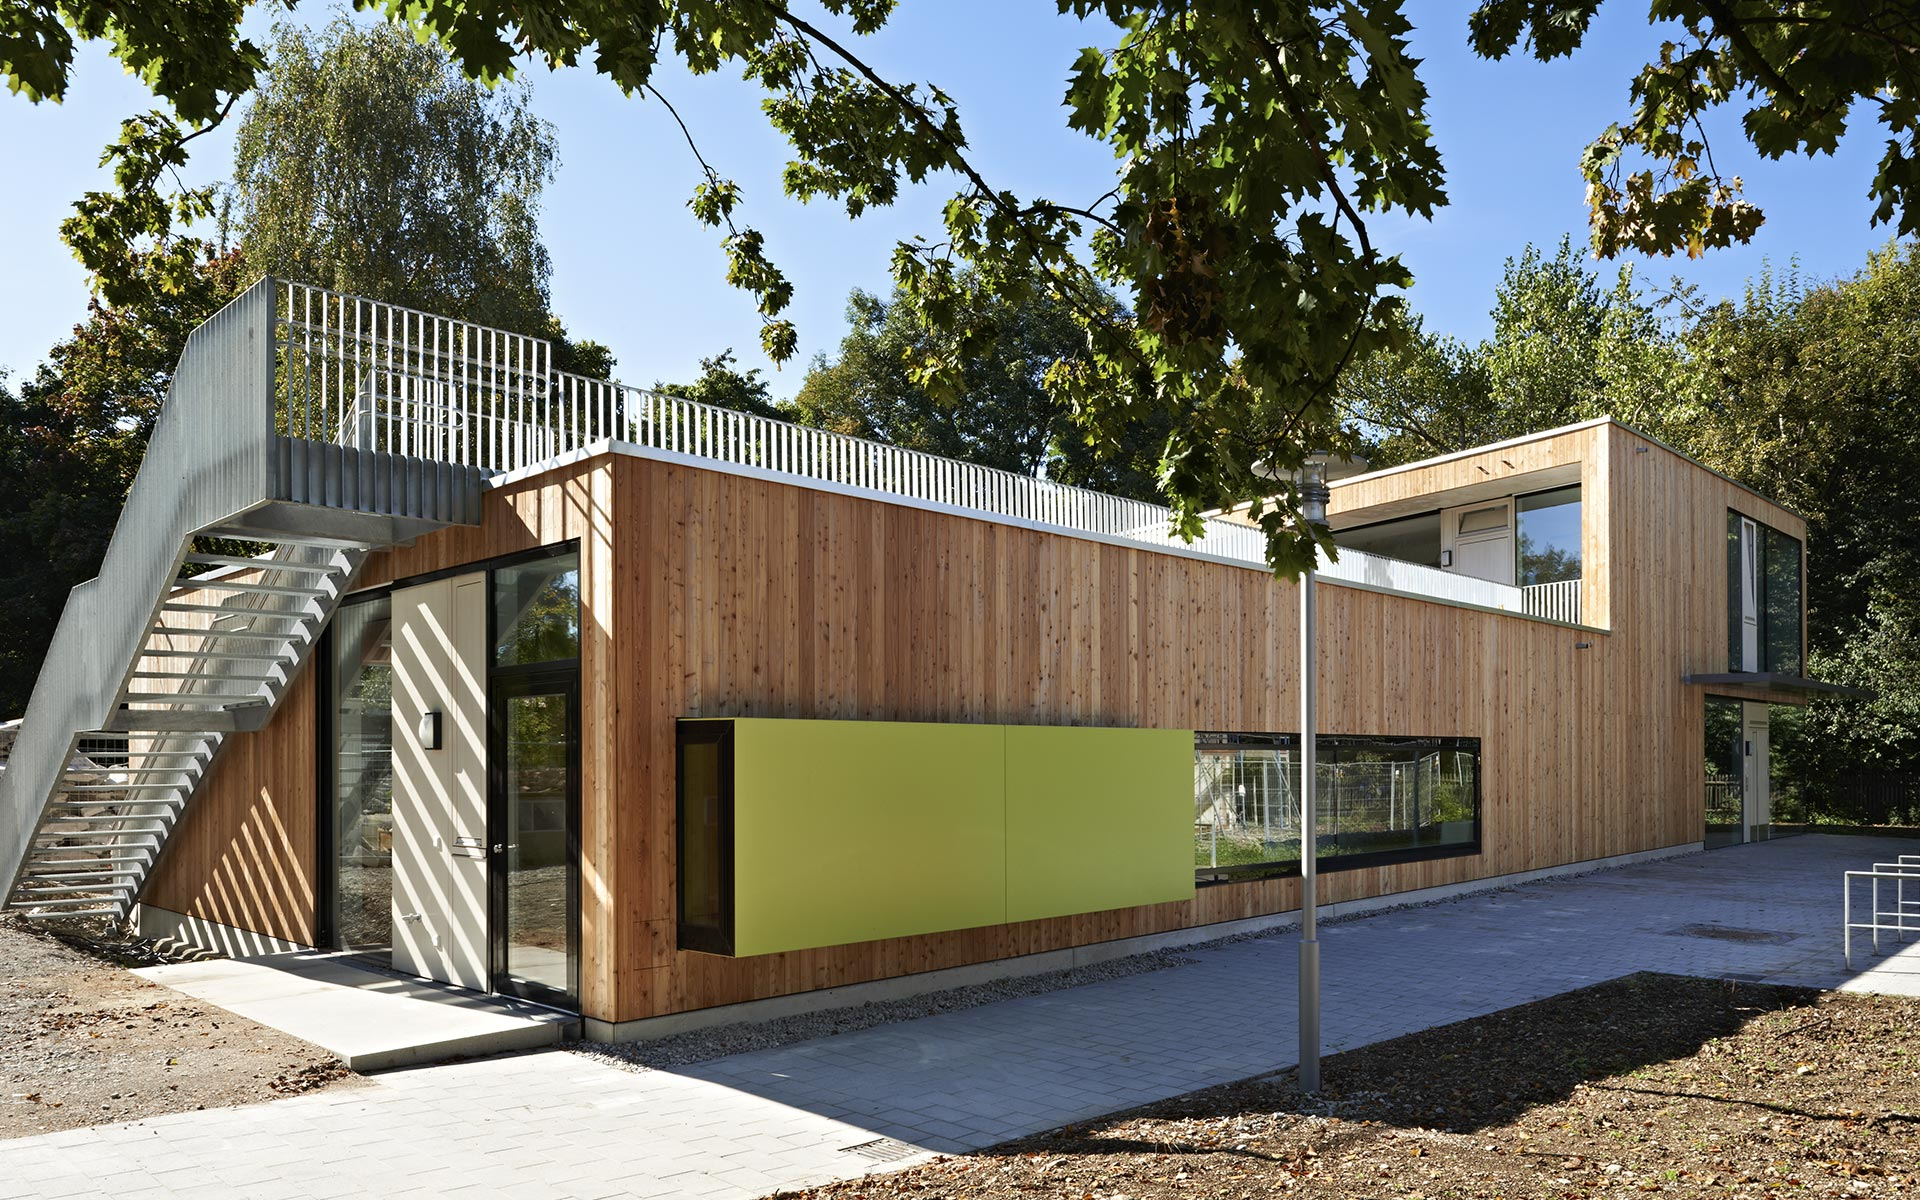 Kindergarten Flohkiste, Garching